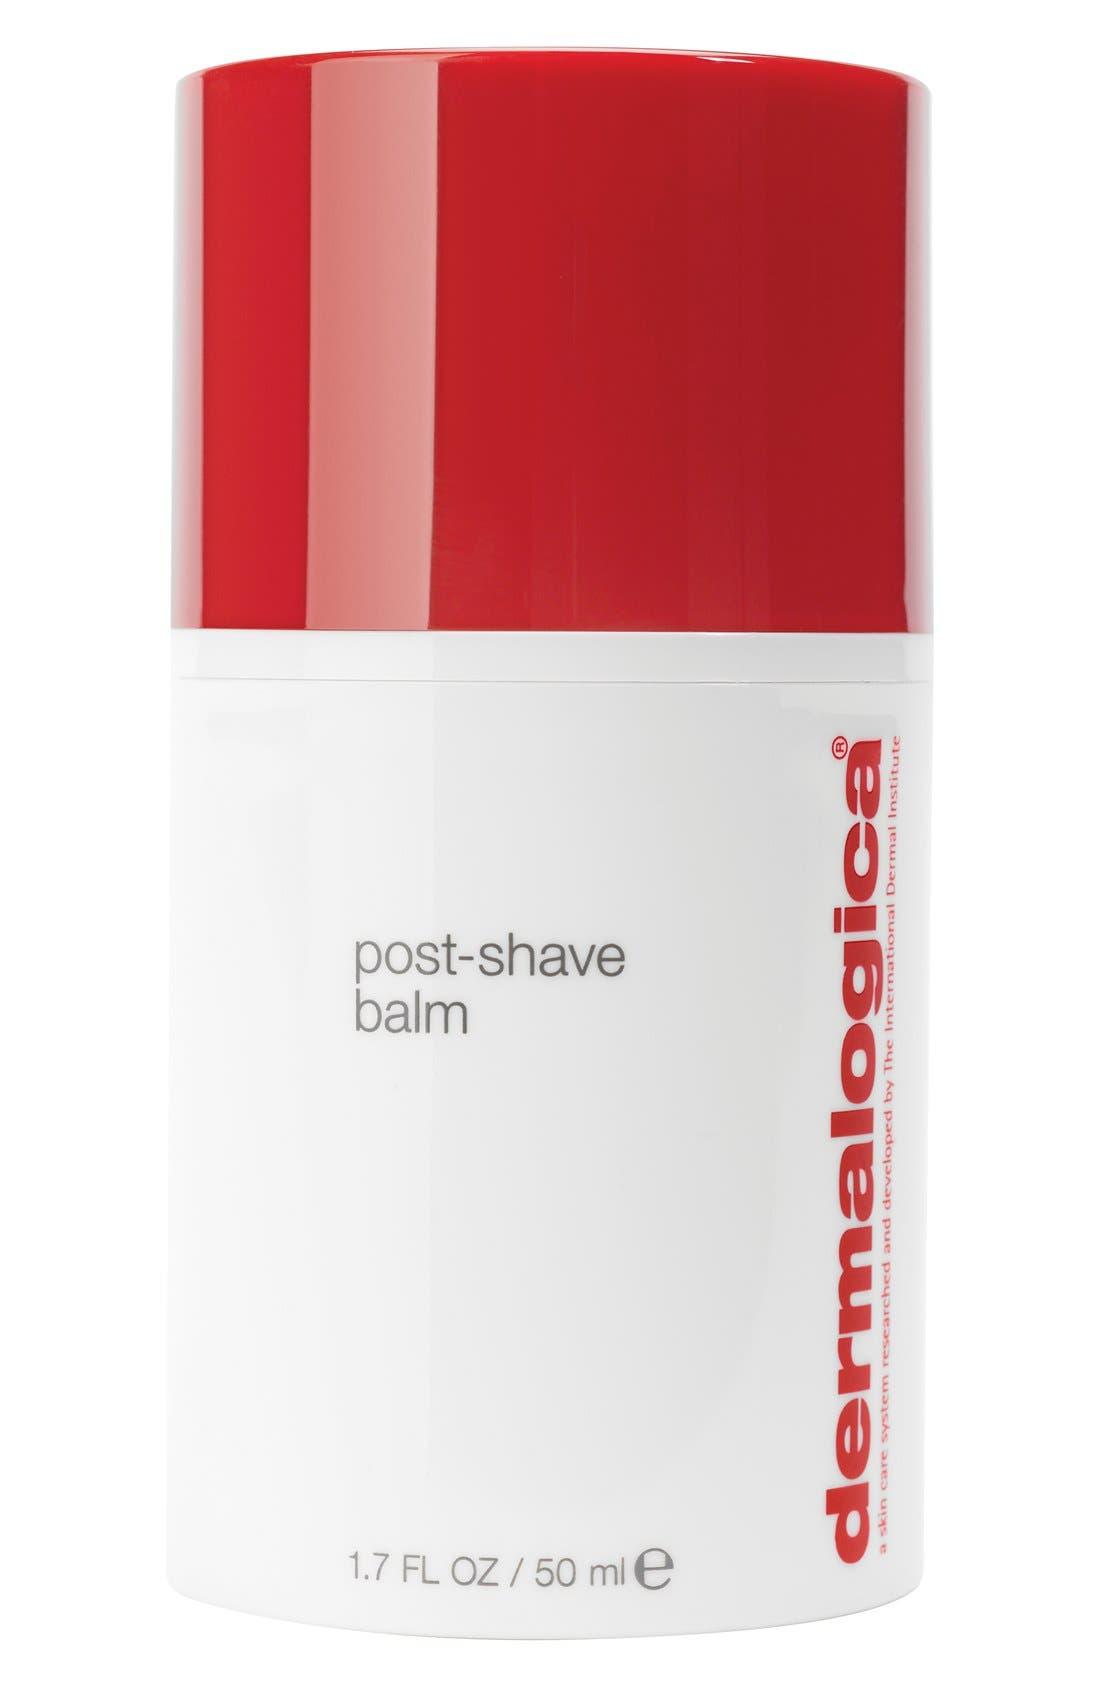 dermalogica® Post-Shave Balm